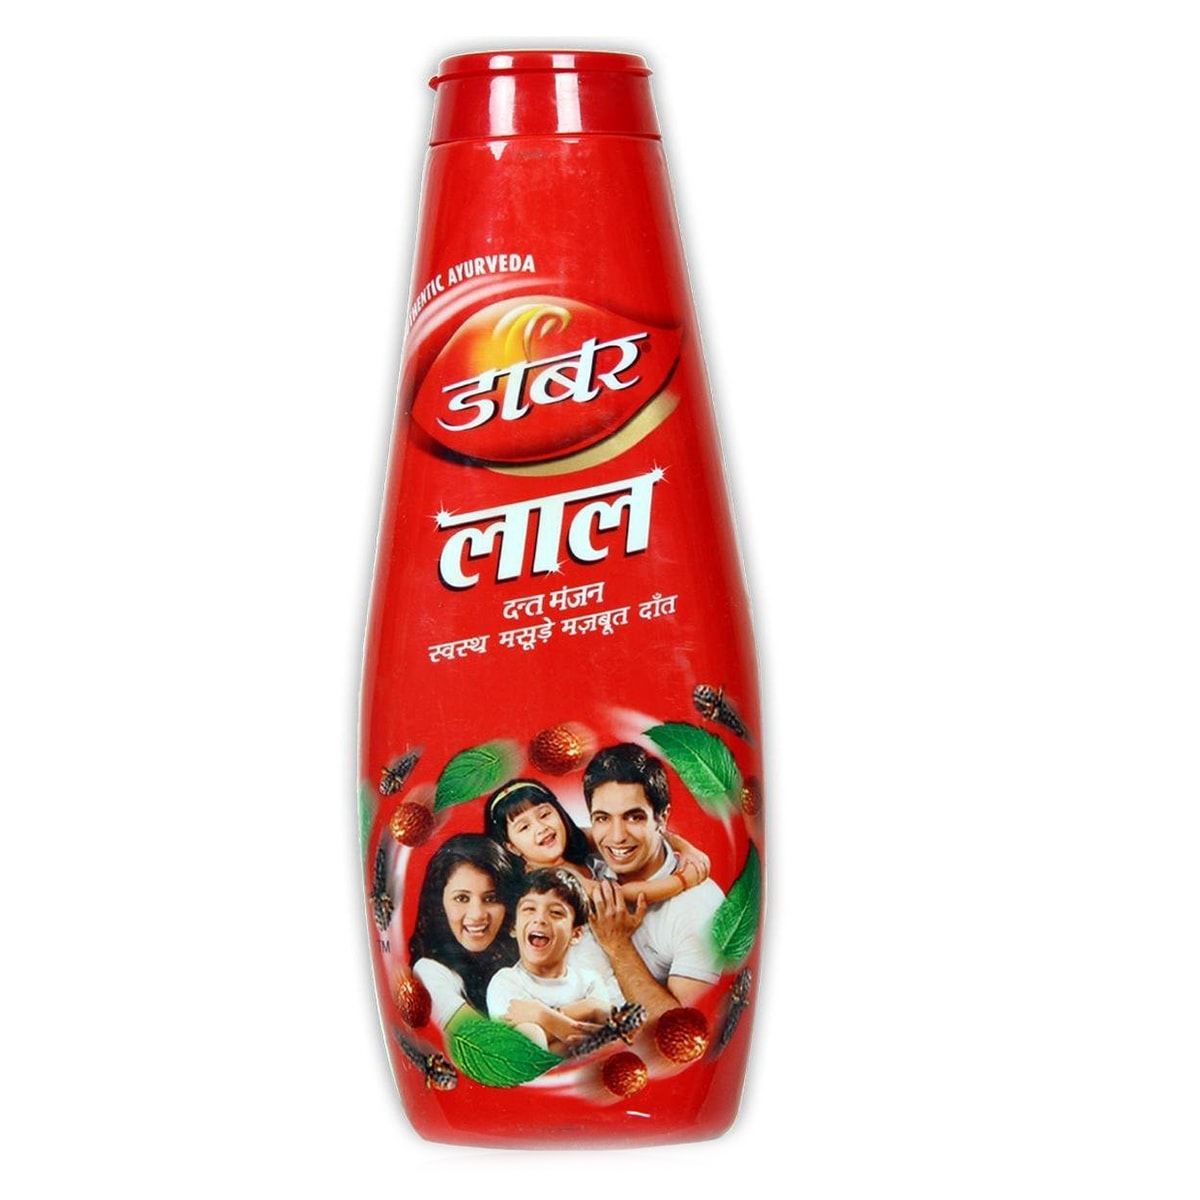 Buy Dabur Lal Dant Manjan (Red Tooth Powder) - 150 gm